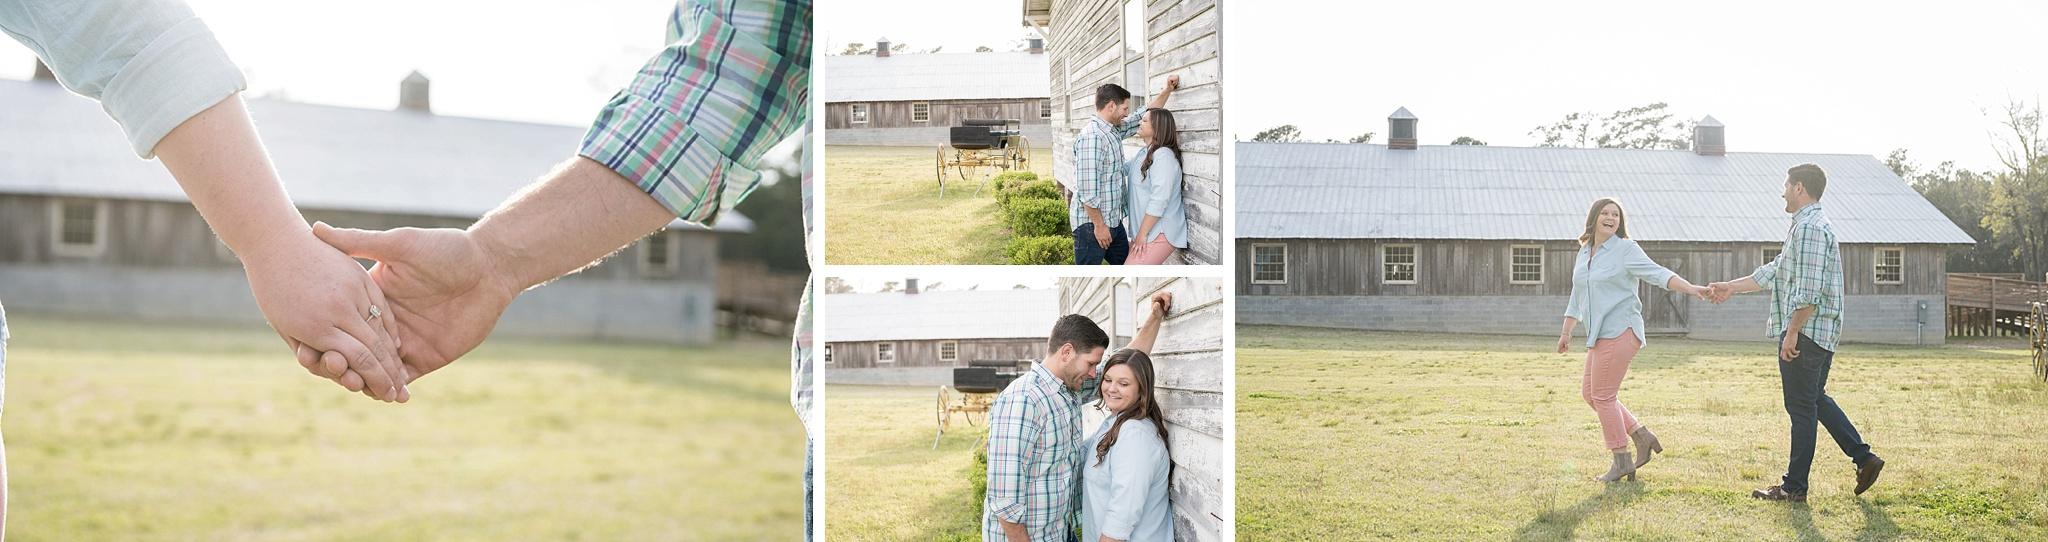 May-Lew-Farm-Farmville-NC-Photographer-059.jpg